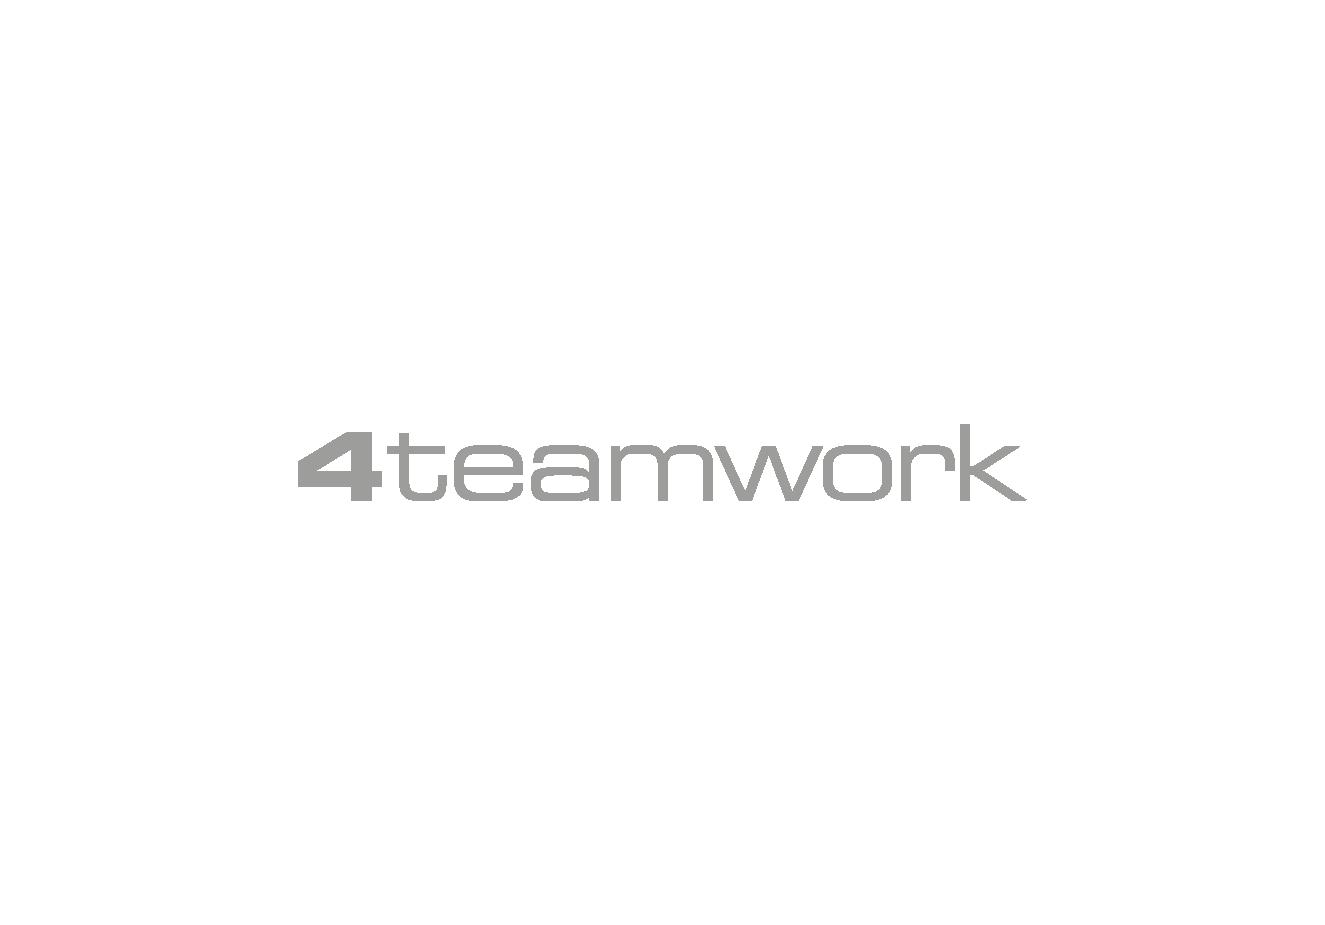 4teamwork-sw